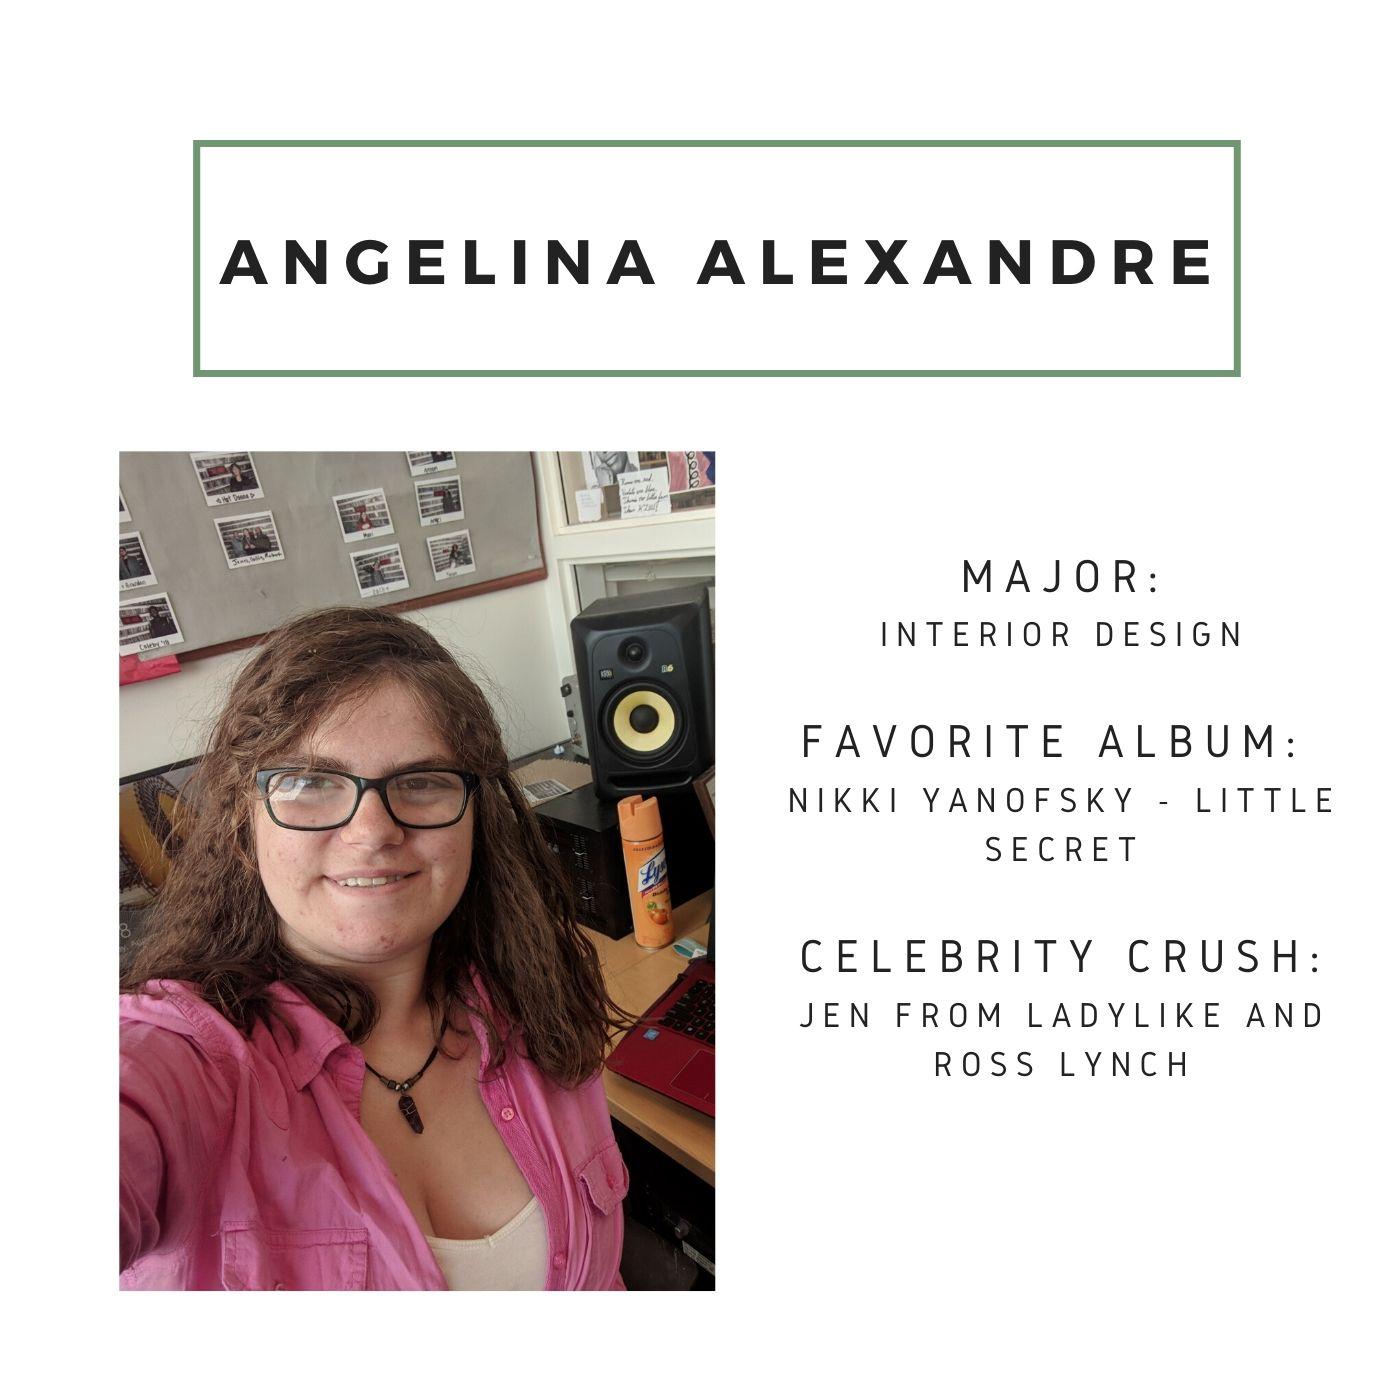 Angelina Alexandre